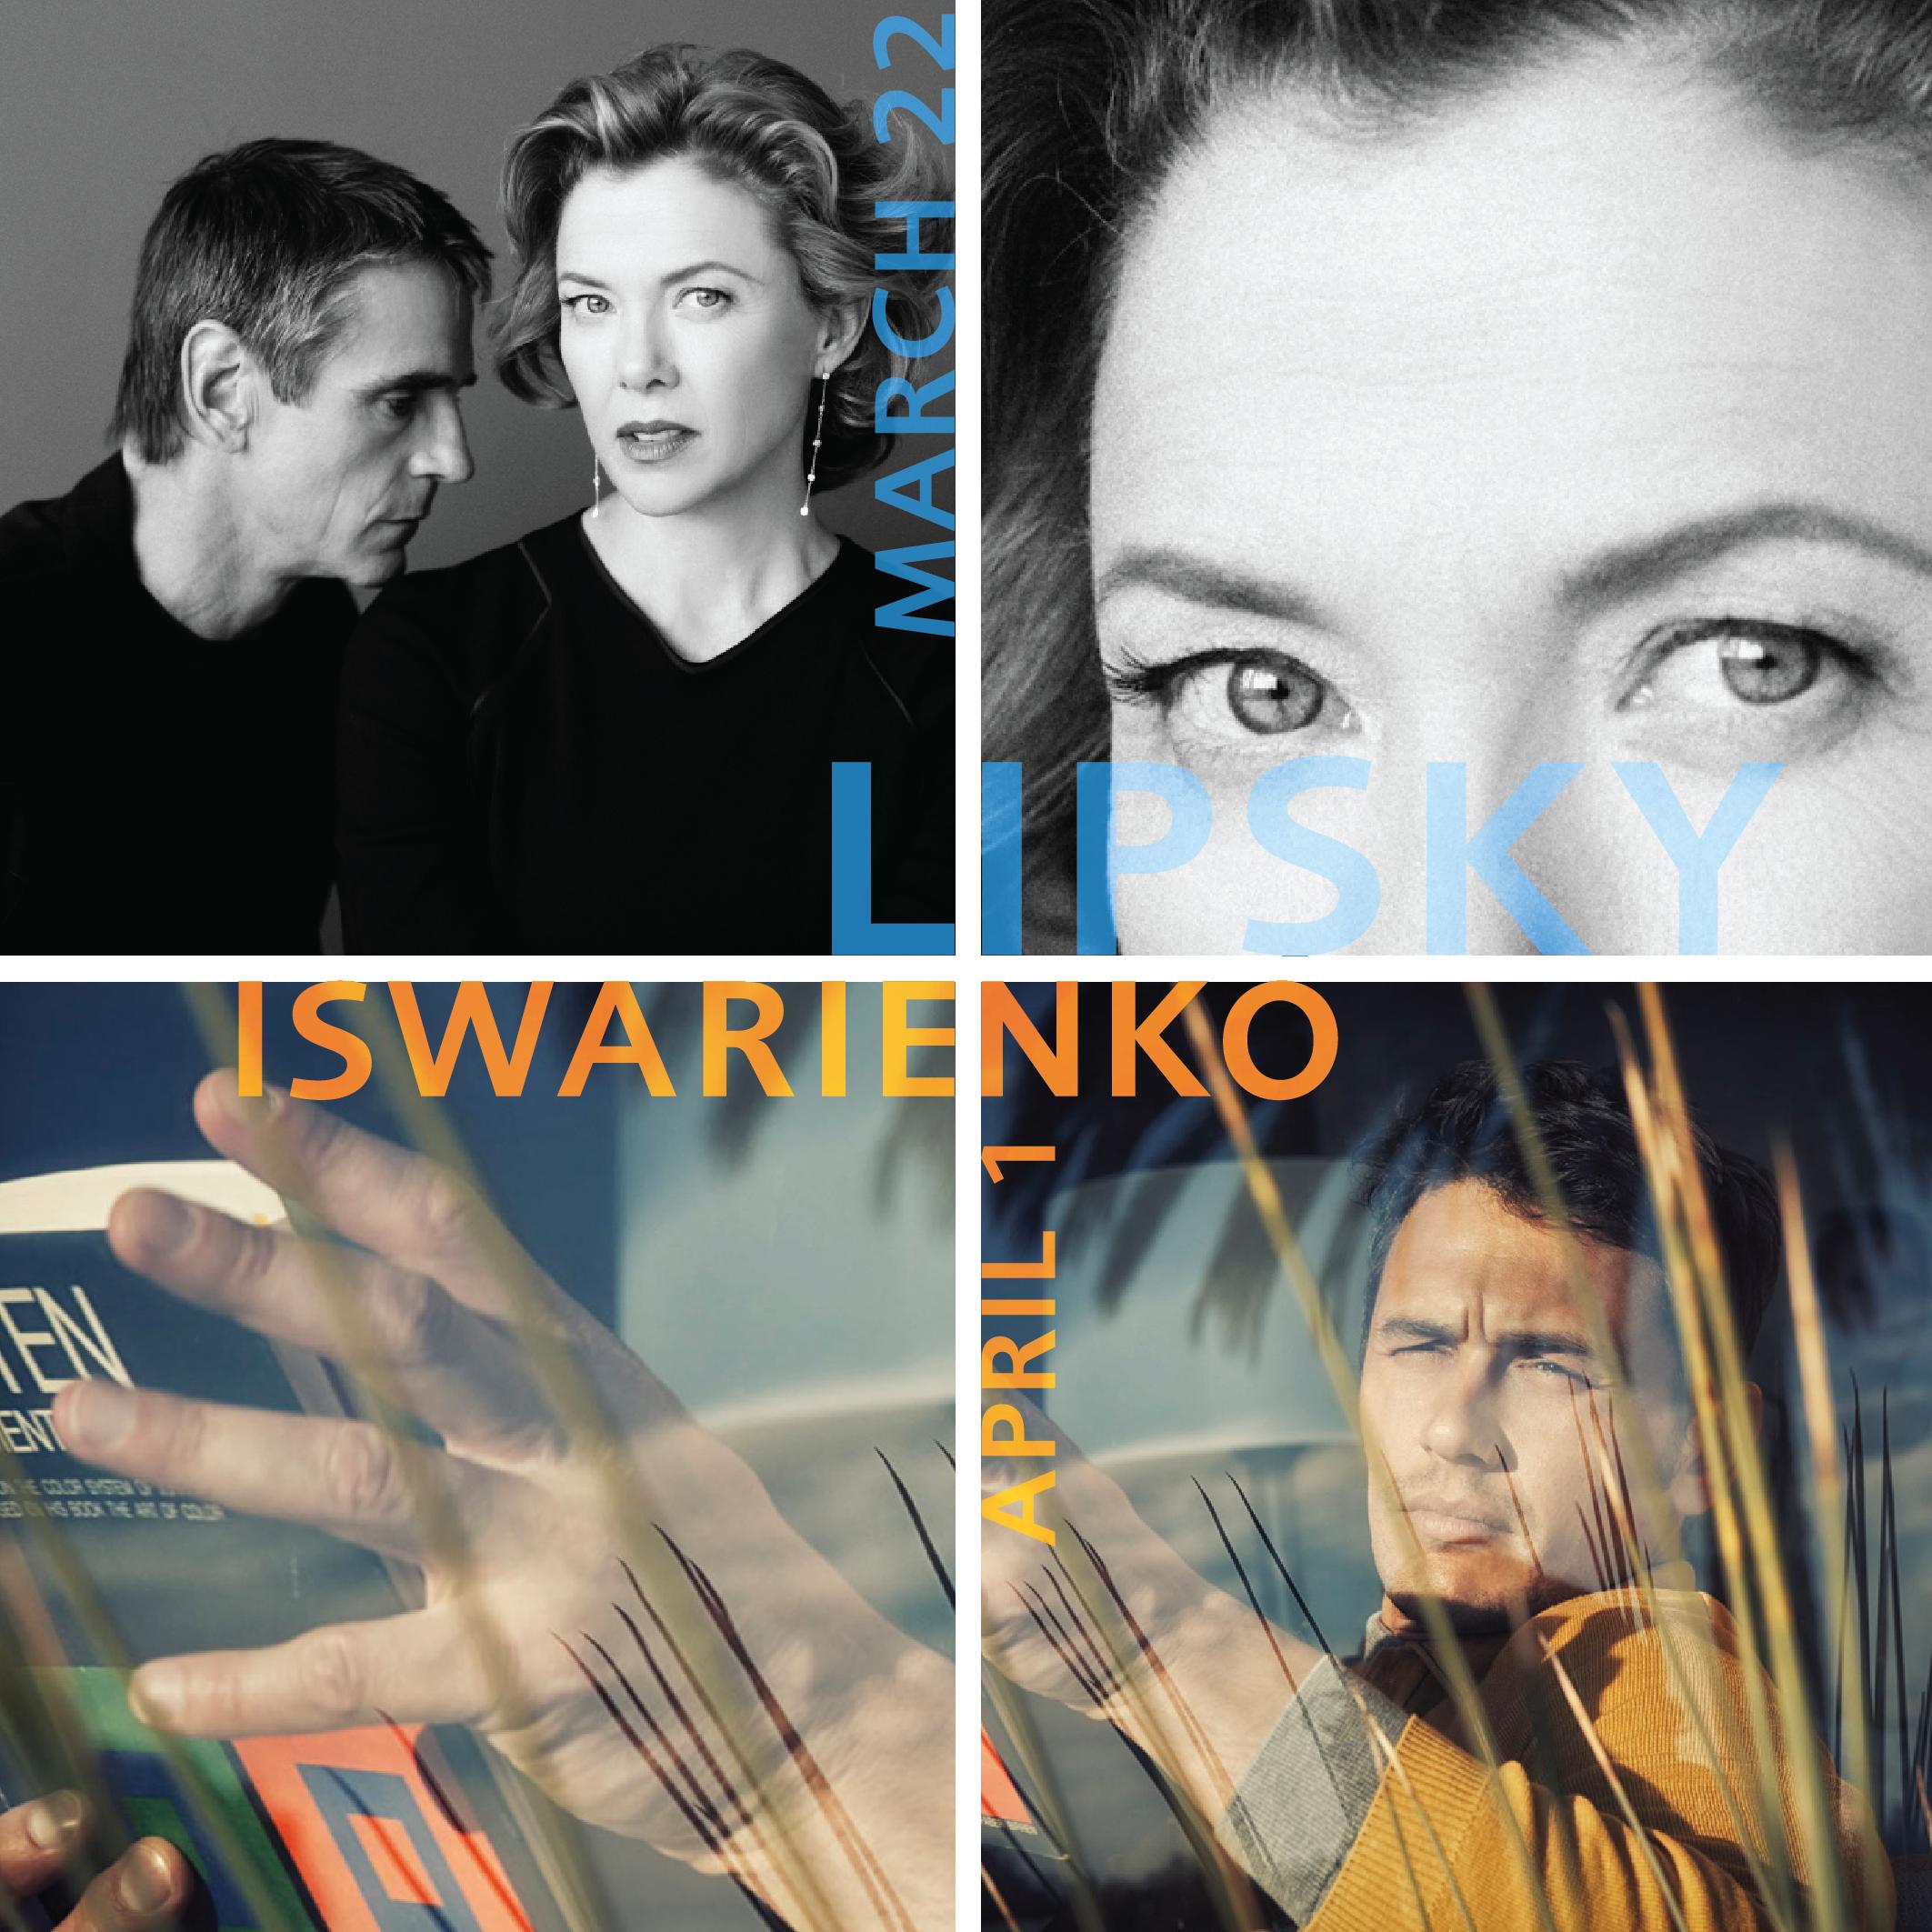 Lipsky & Iswarienko